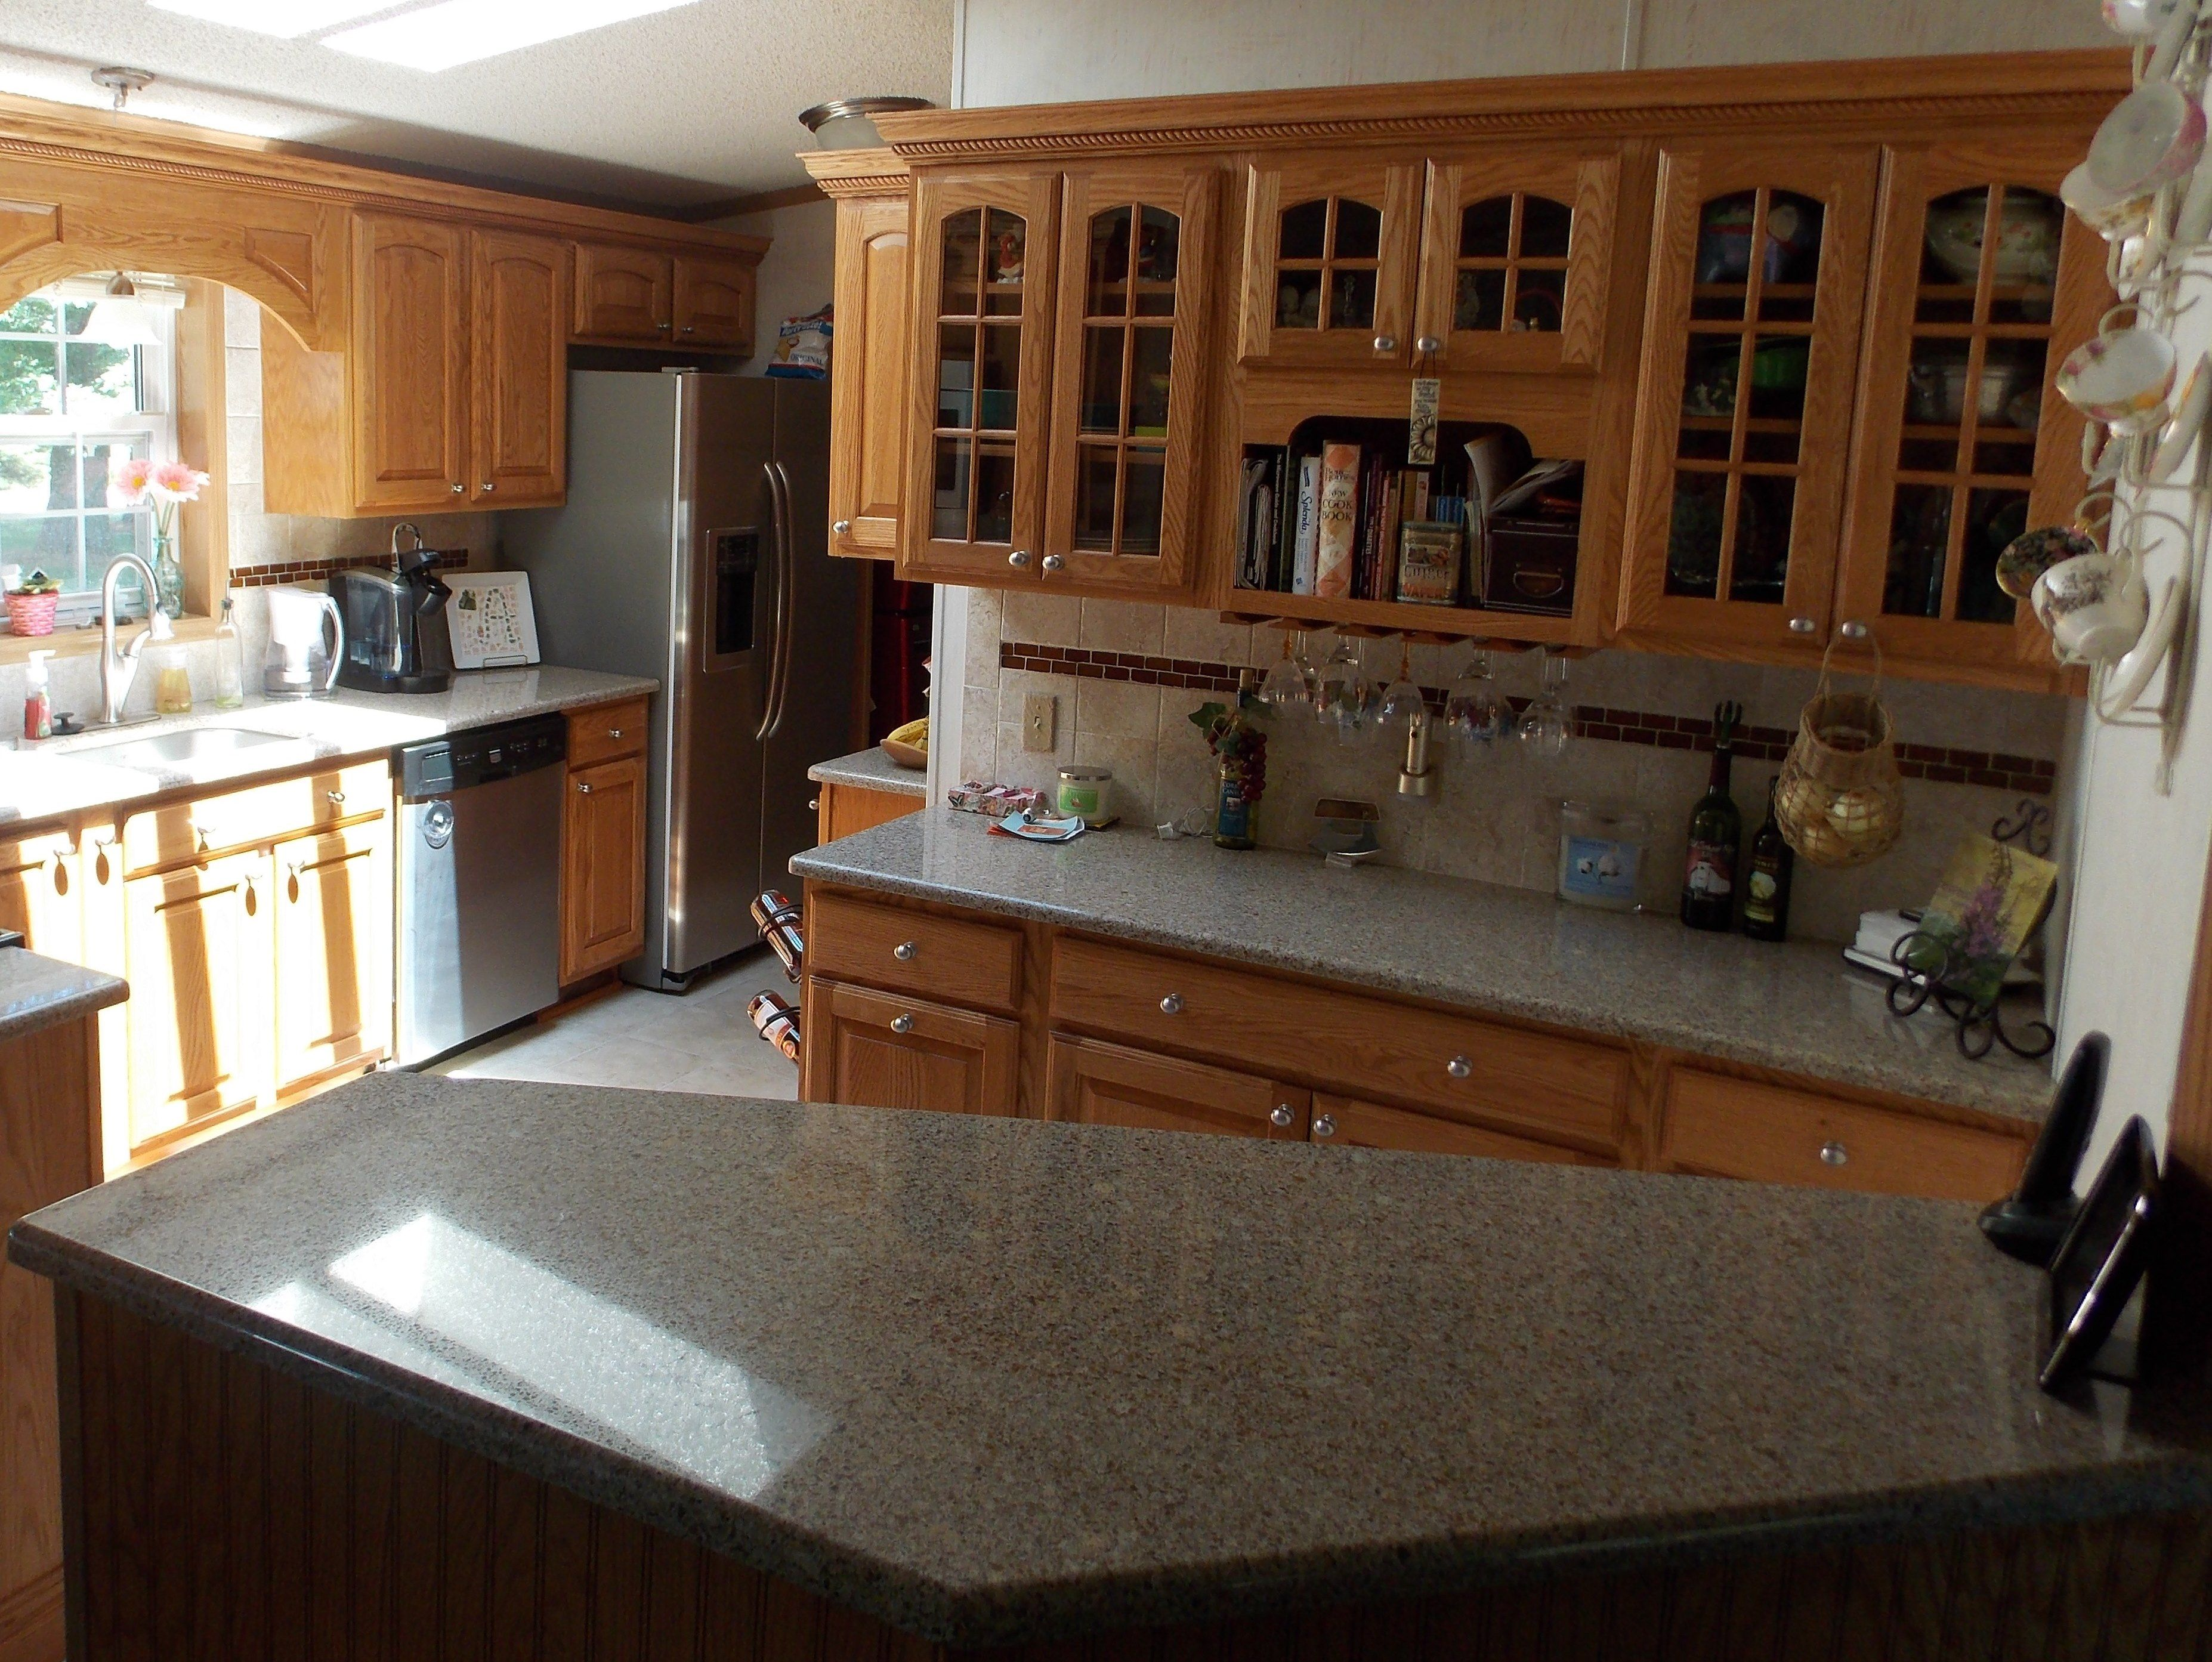 Kitchen remodel using American Olean tile Medallion Napa Valley